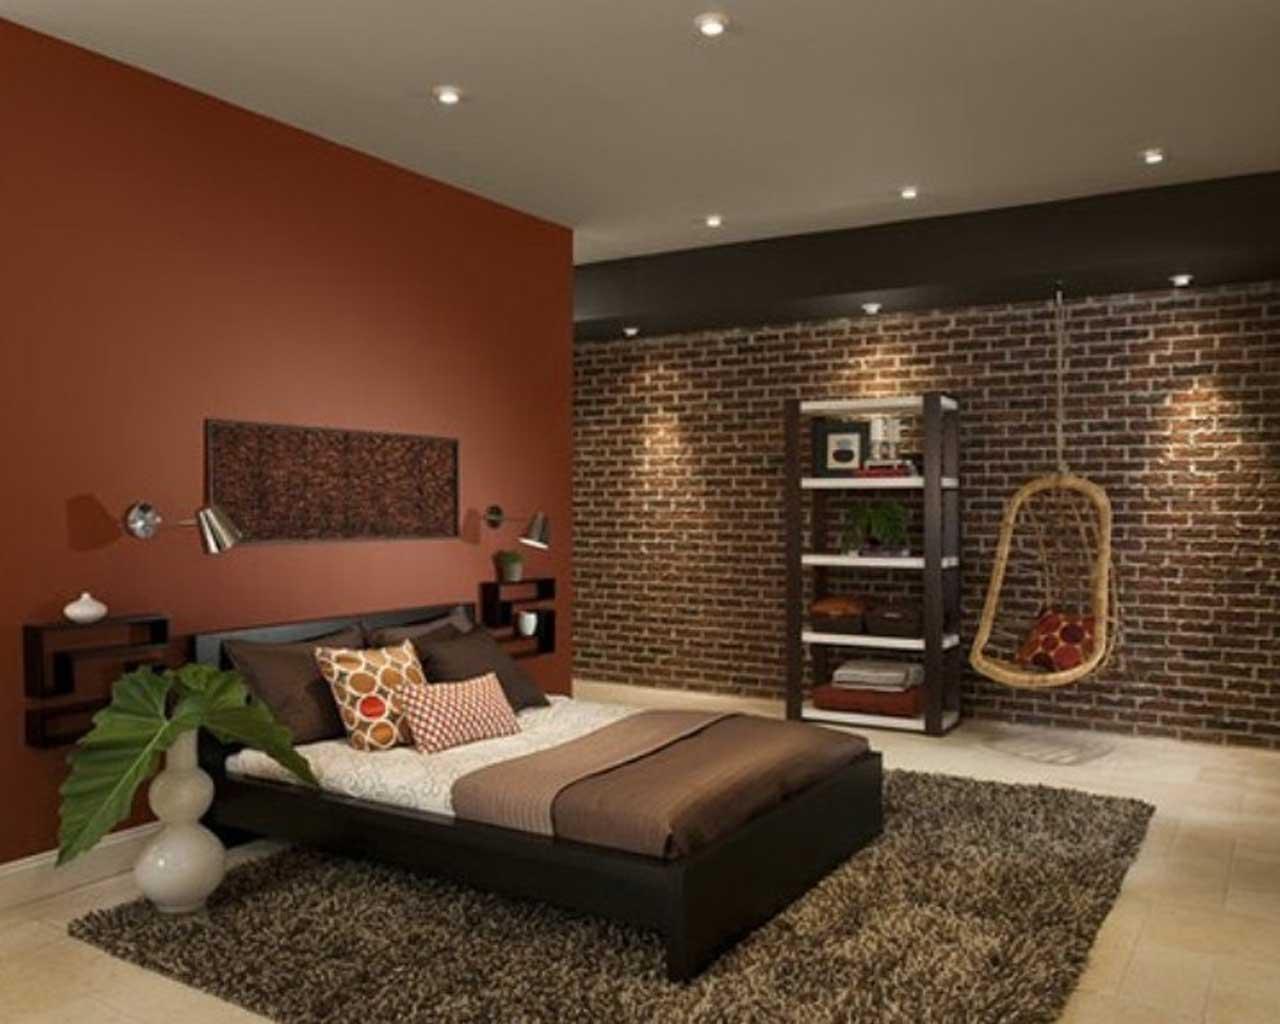 ... brilliant interior design ideas 13 for with interior design ideas ... BTYUACL